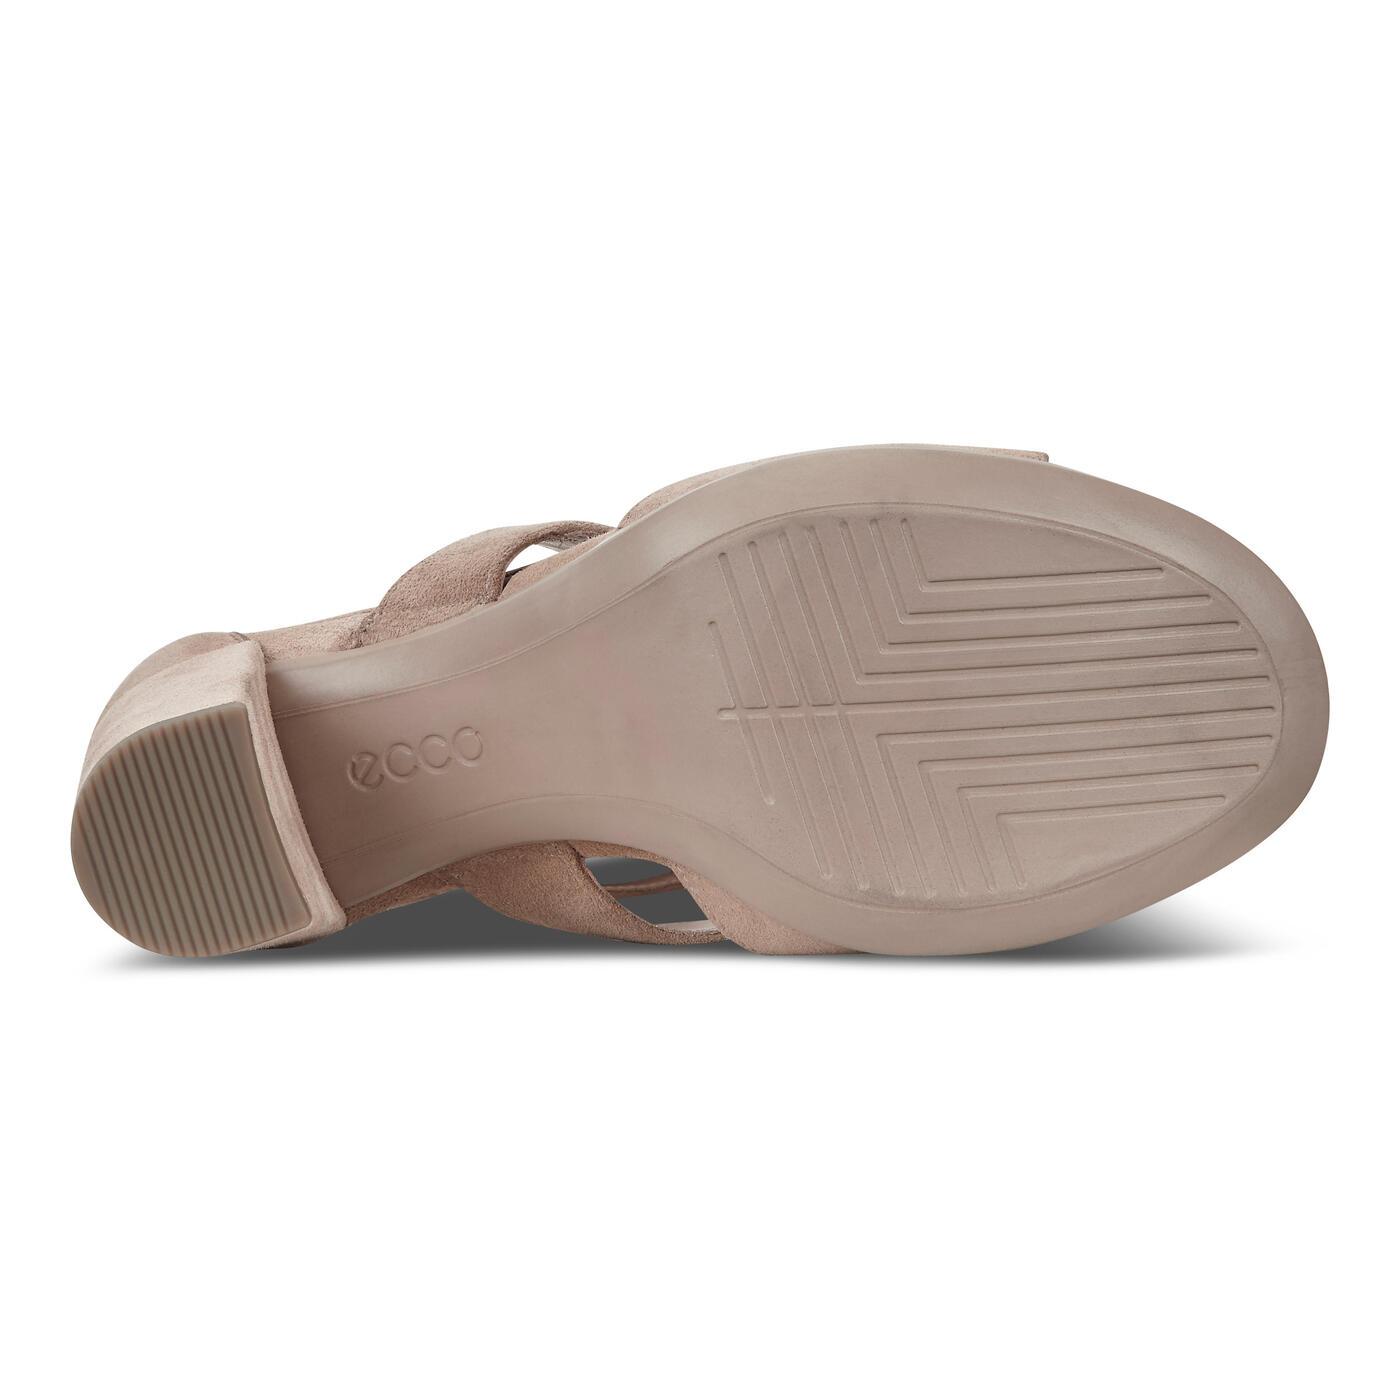 ECCO SHAPE BLOCK SANDAL Ankle Strap 65mm